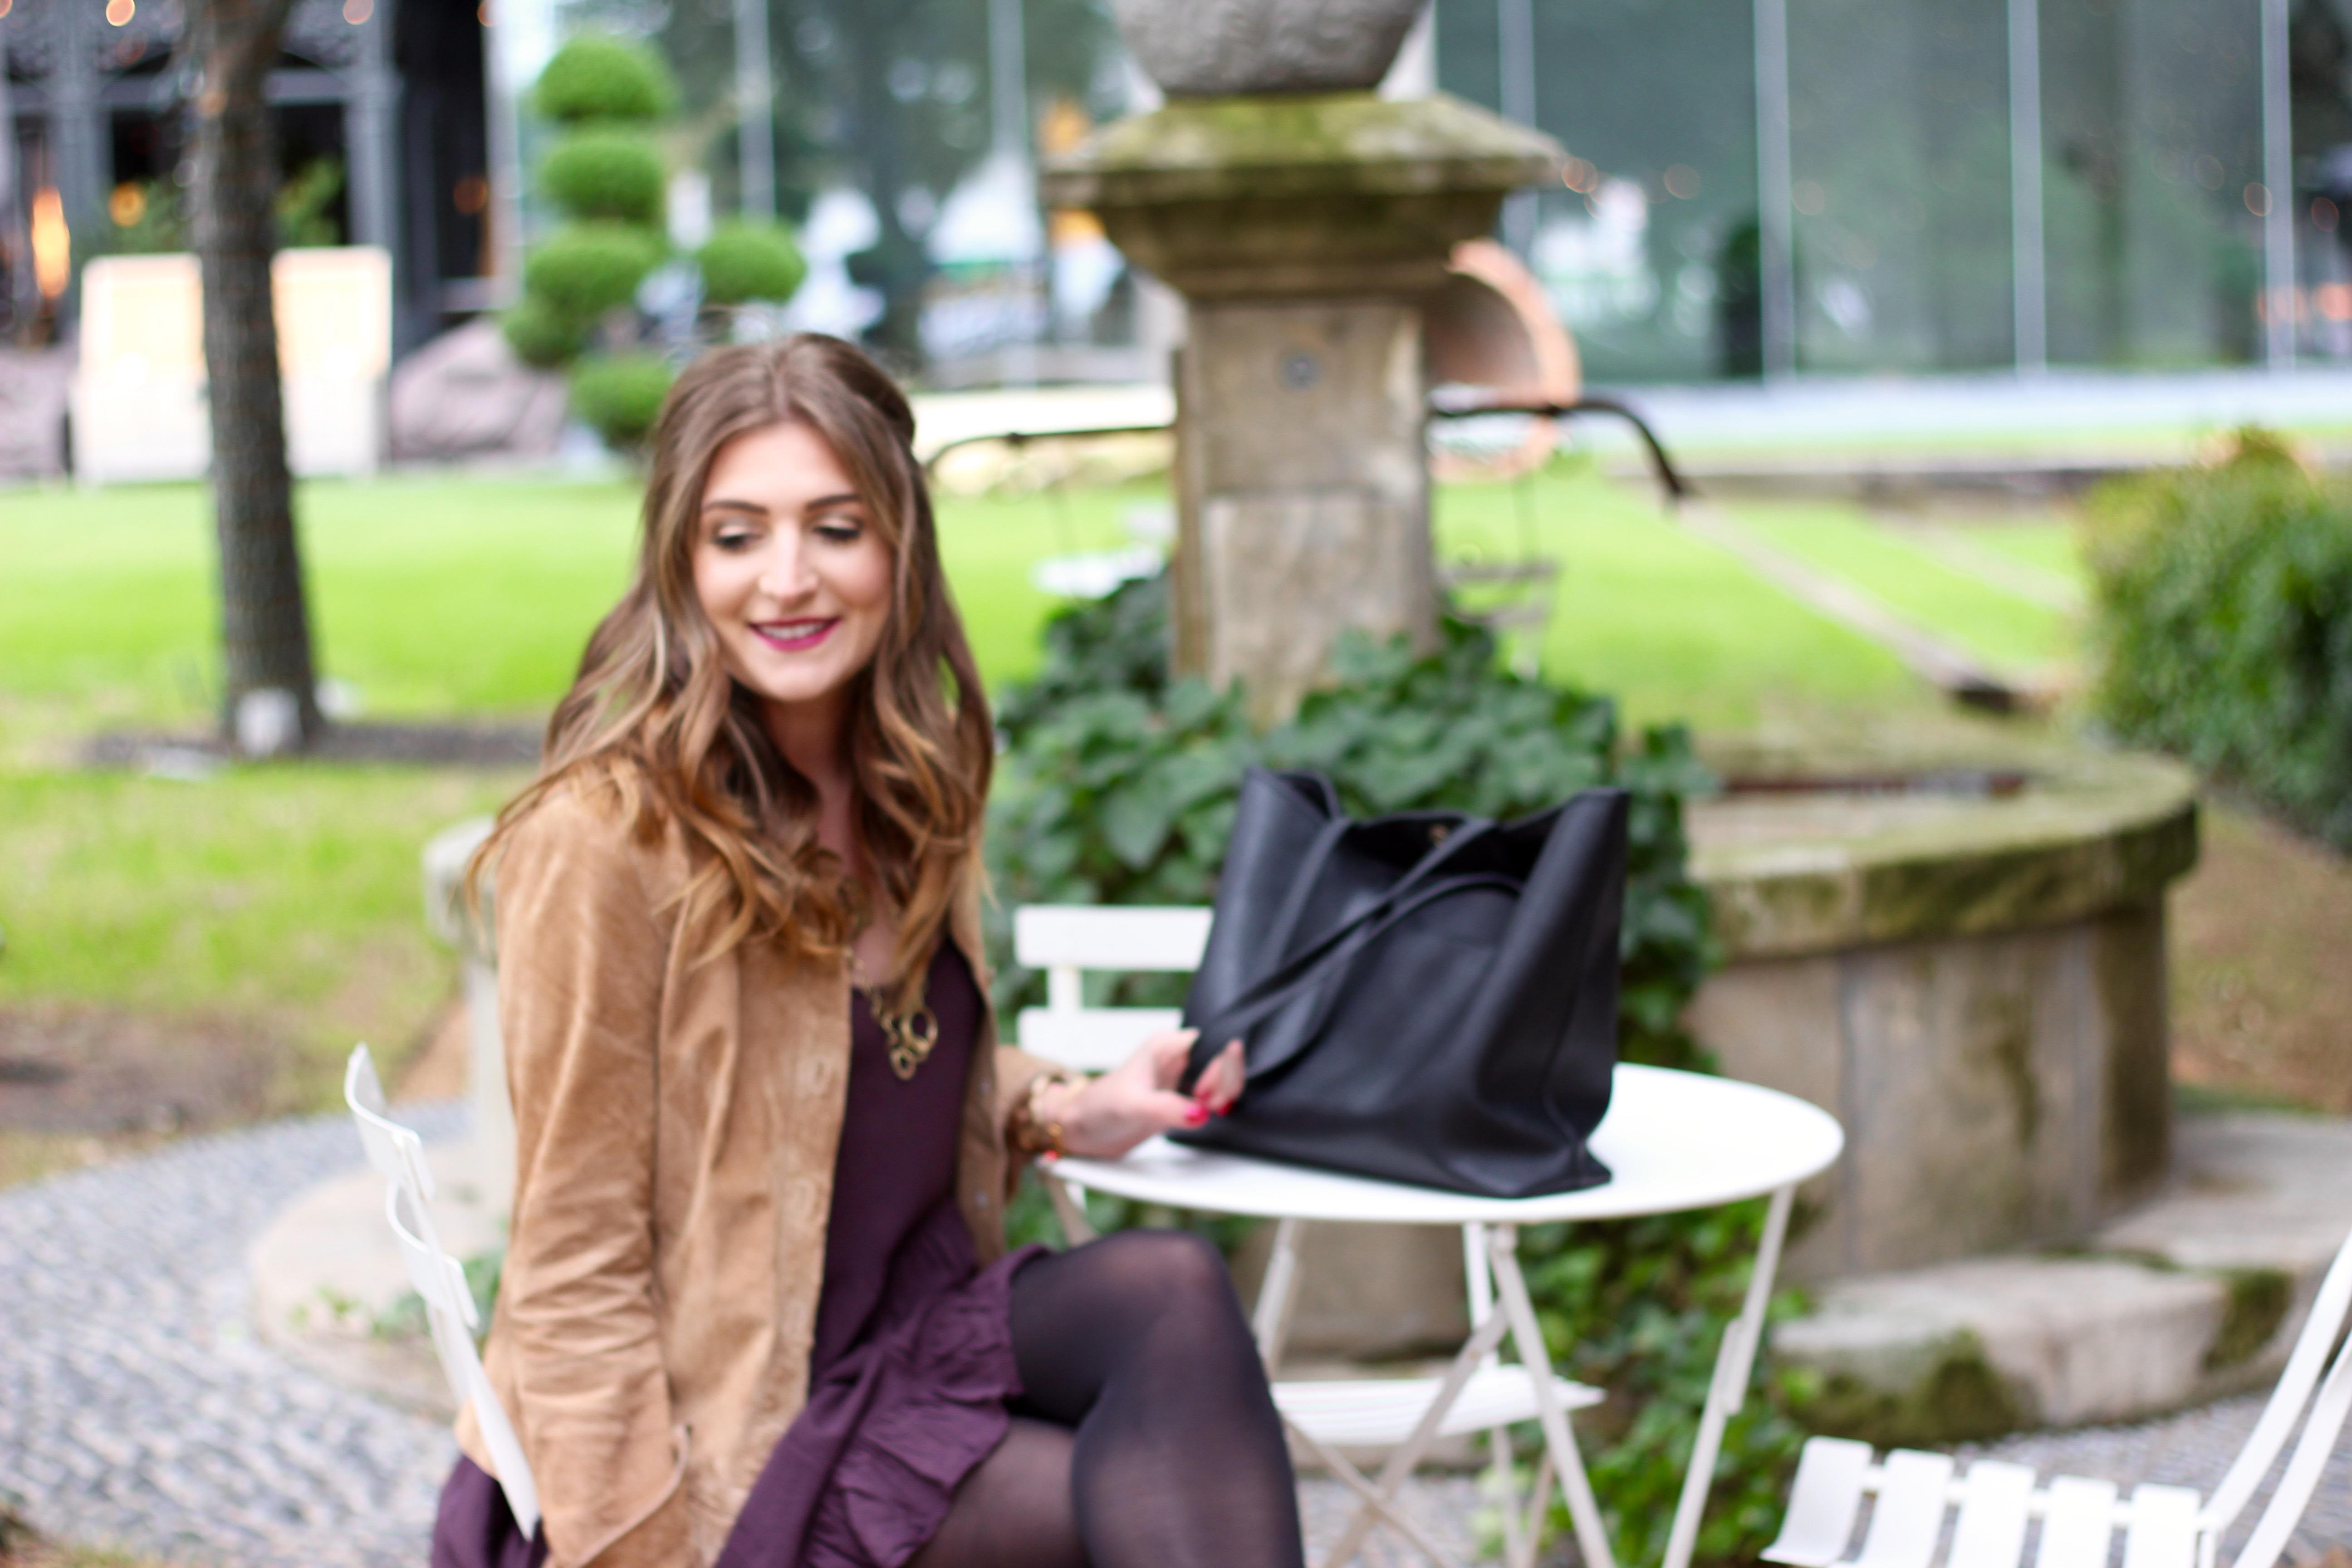 sitting in a courtyard in a flowy dress